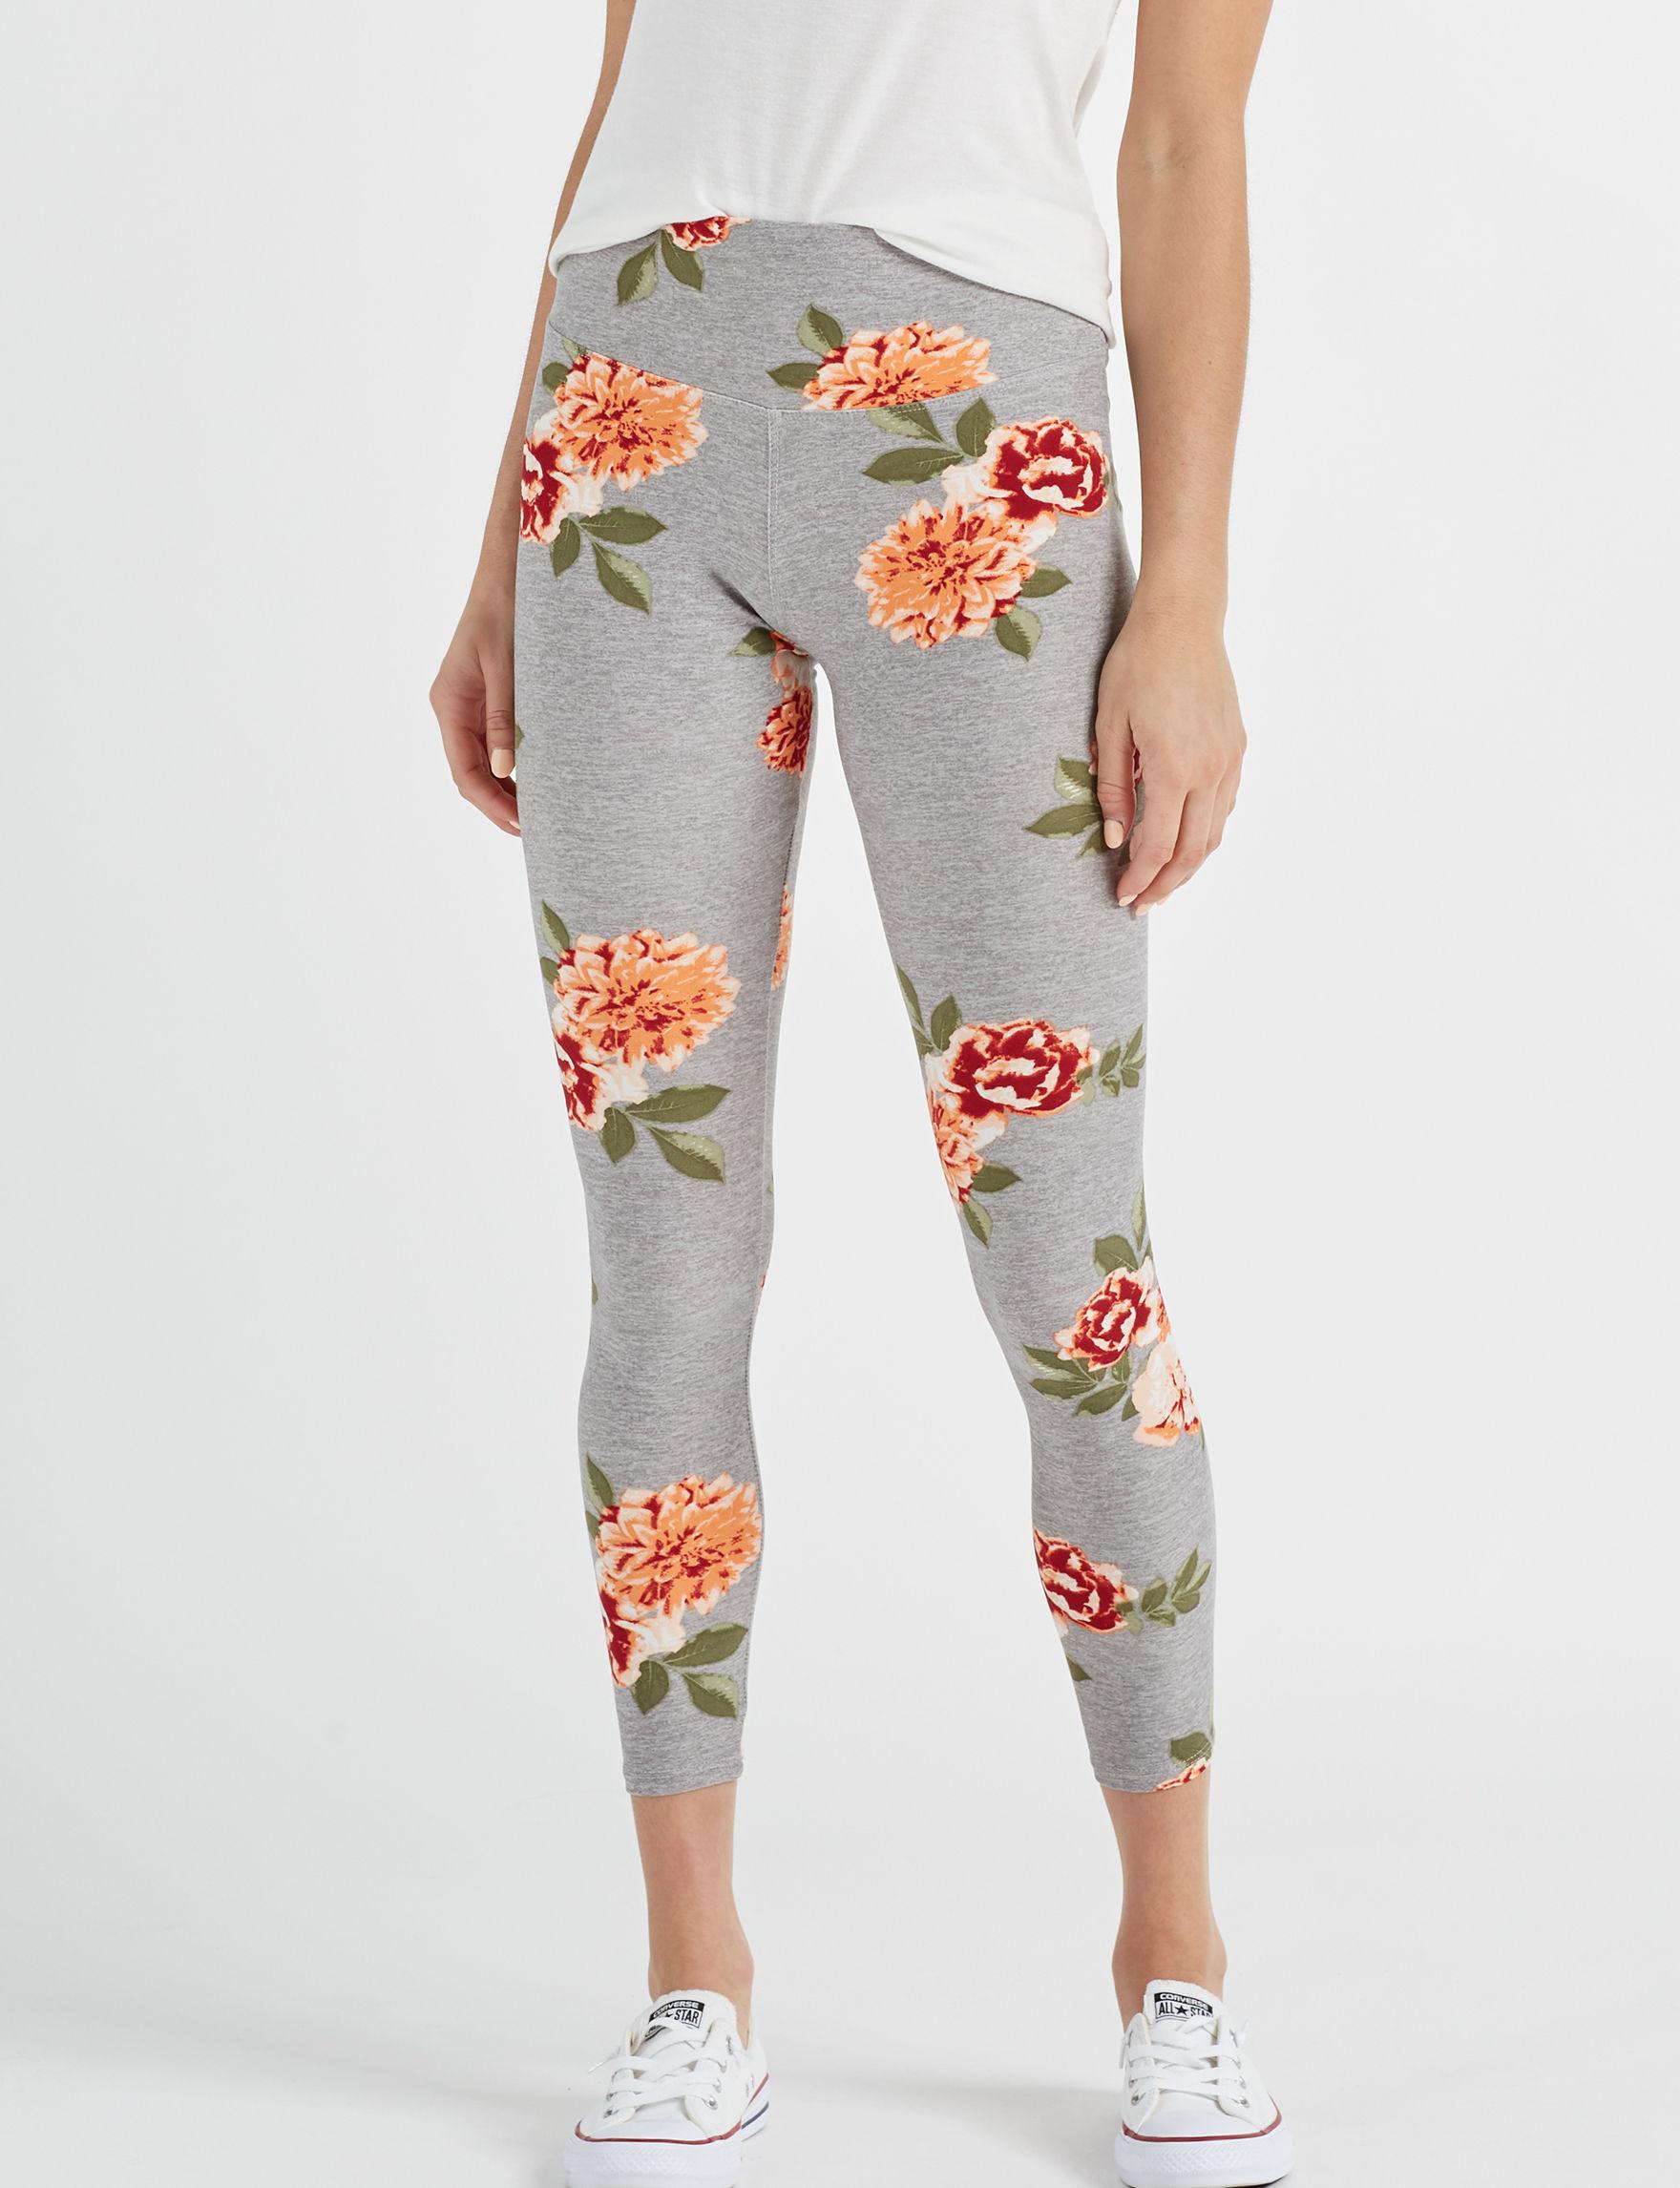 Justify Grey Soft Pants Stretch